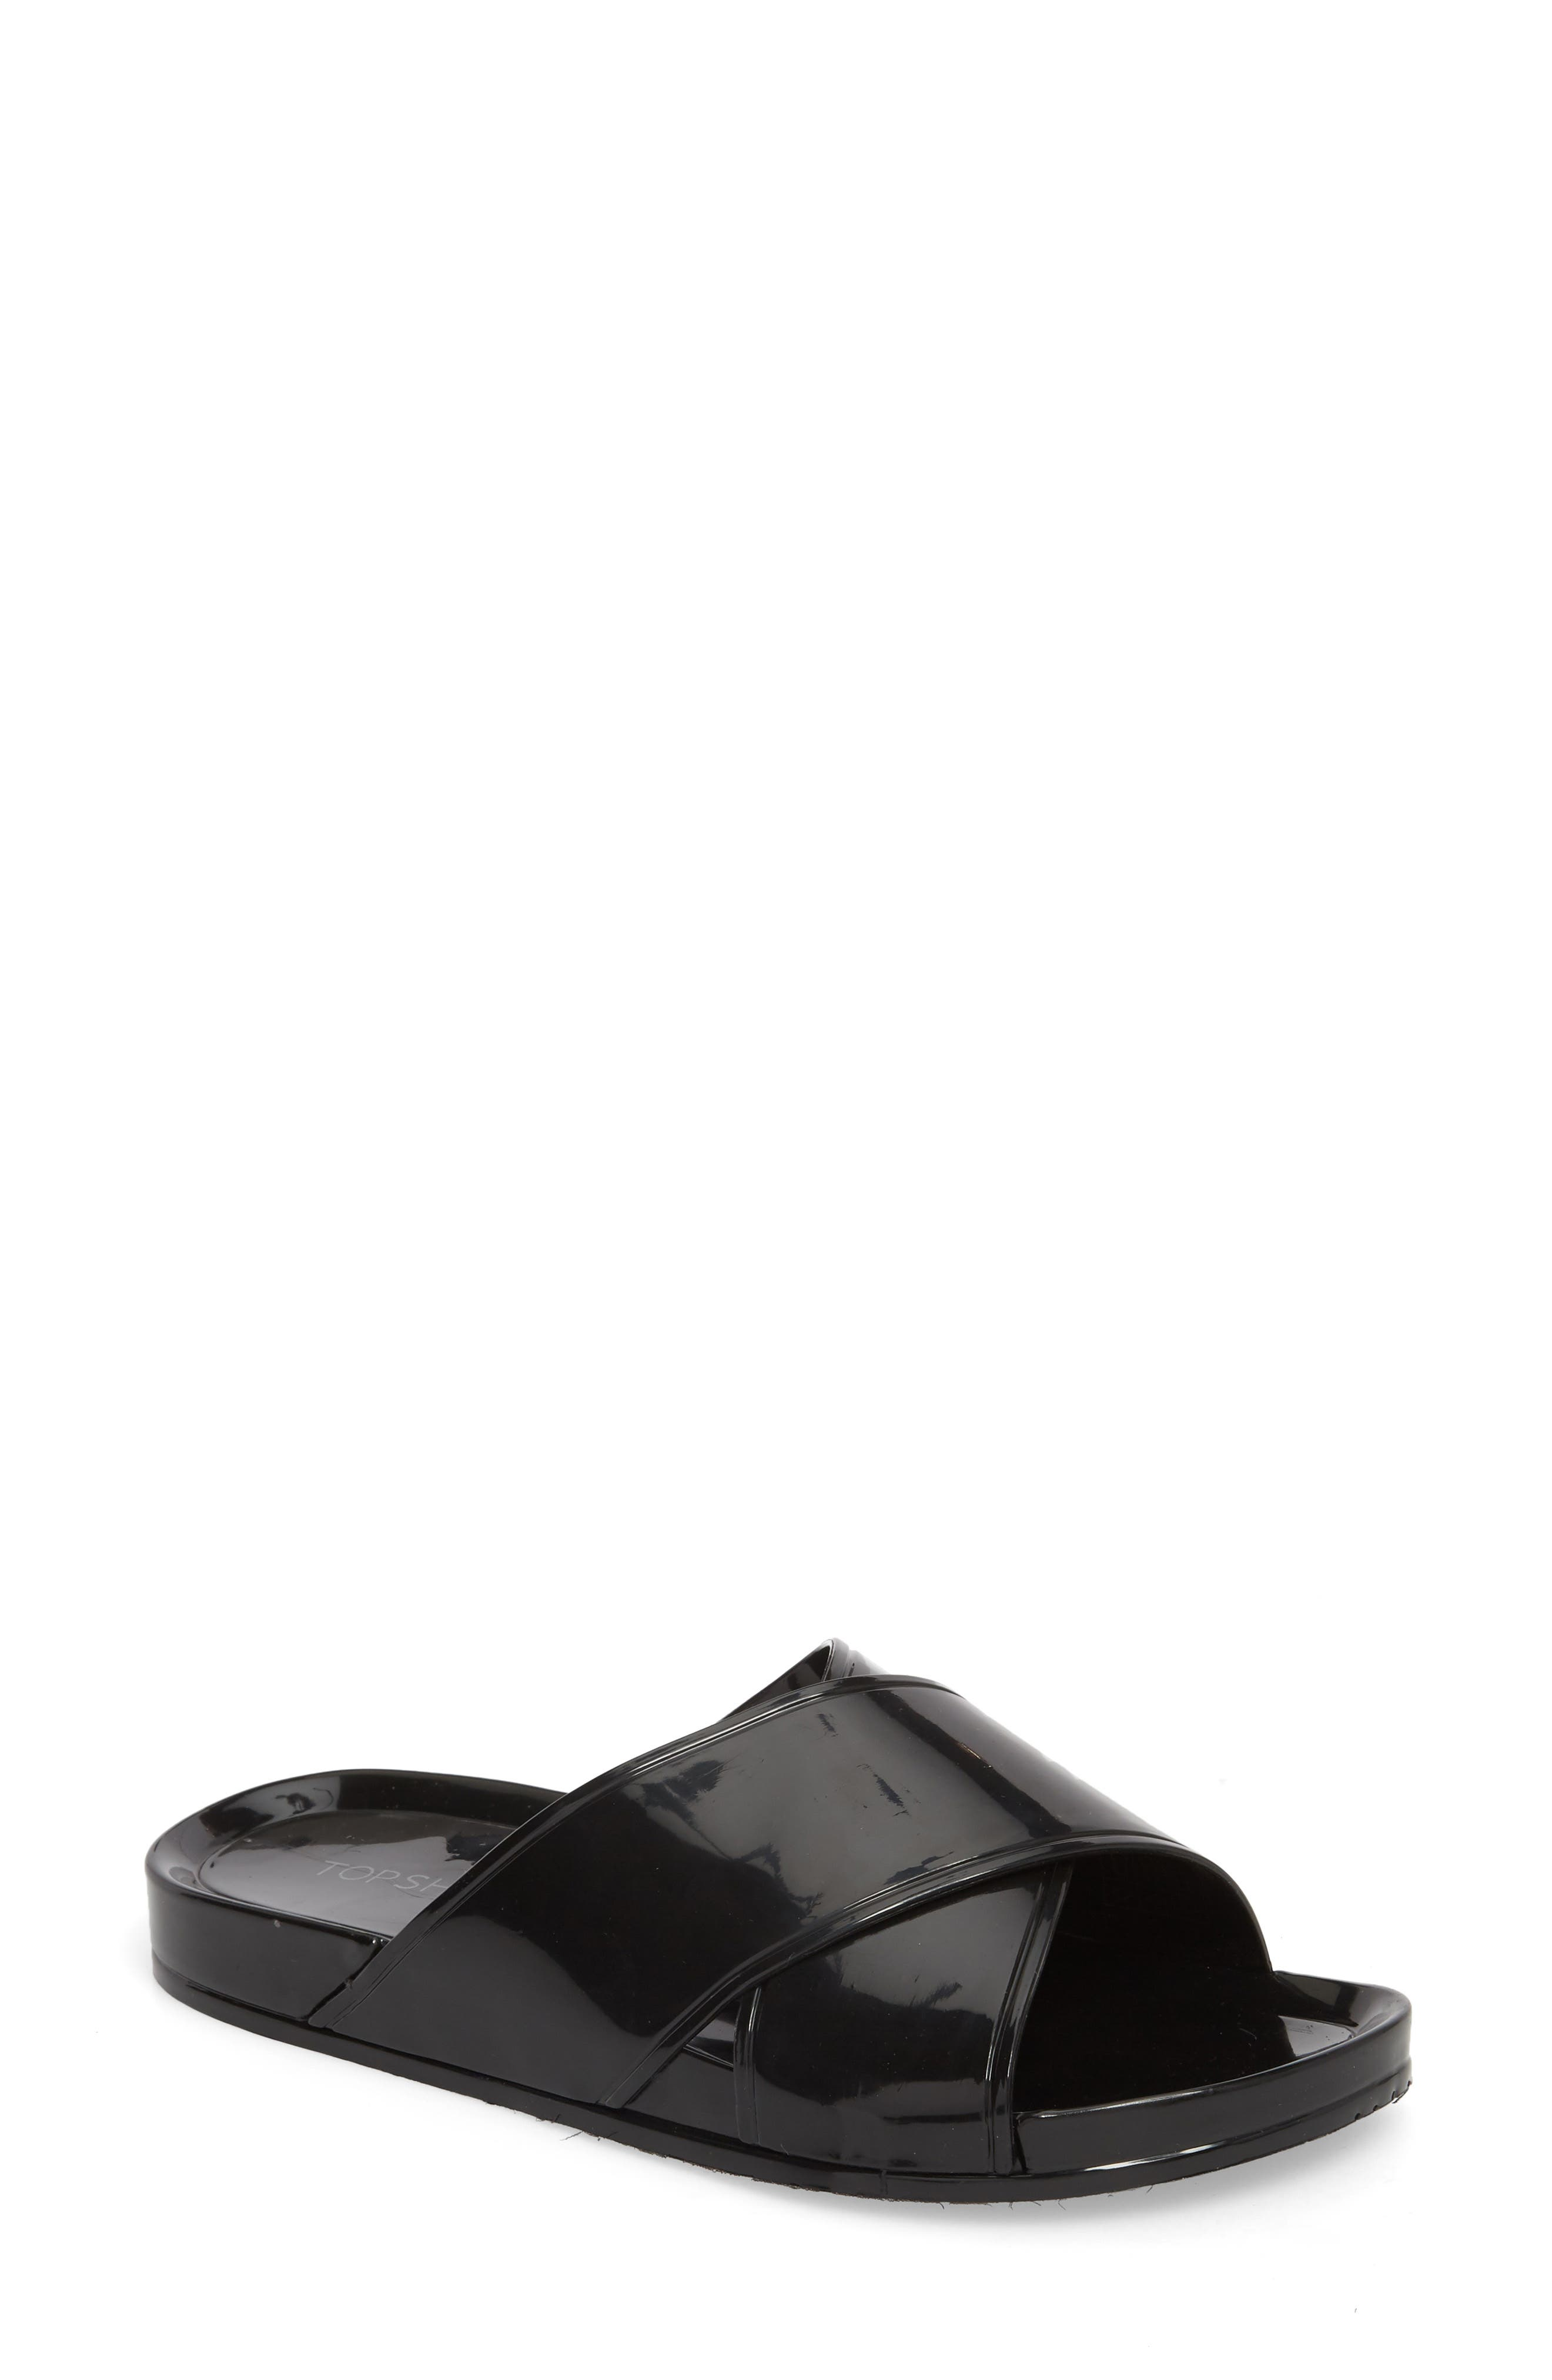 Roxy Jelly Slide Sandal,                         Main,                         color, 001